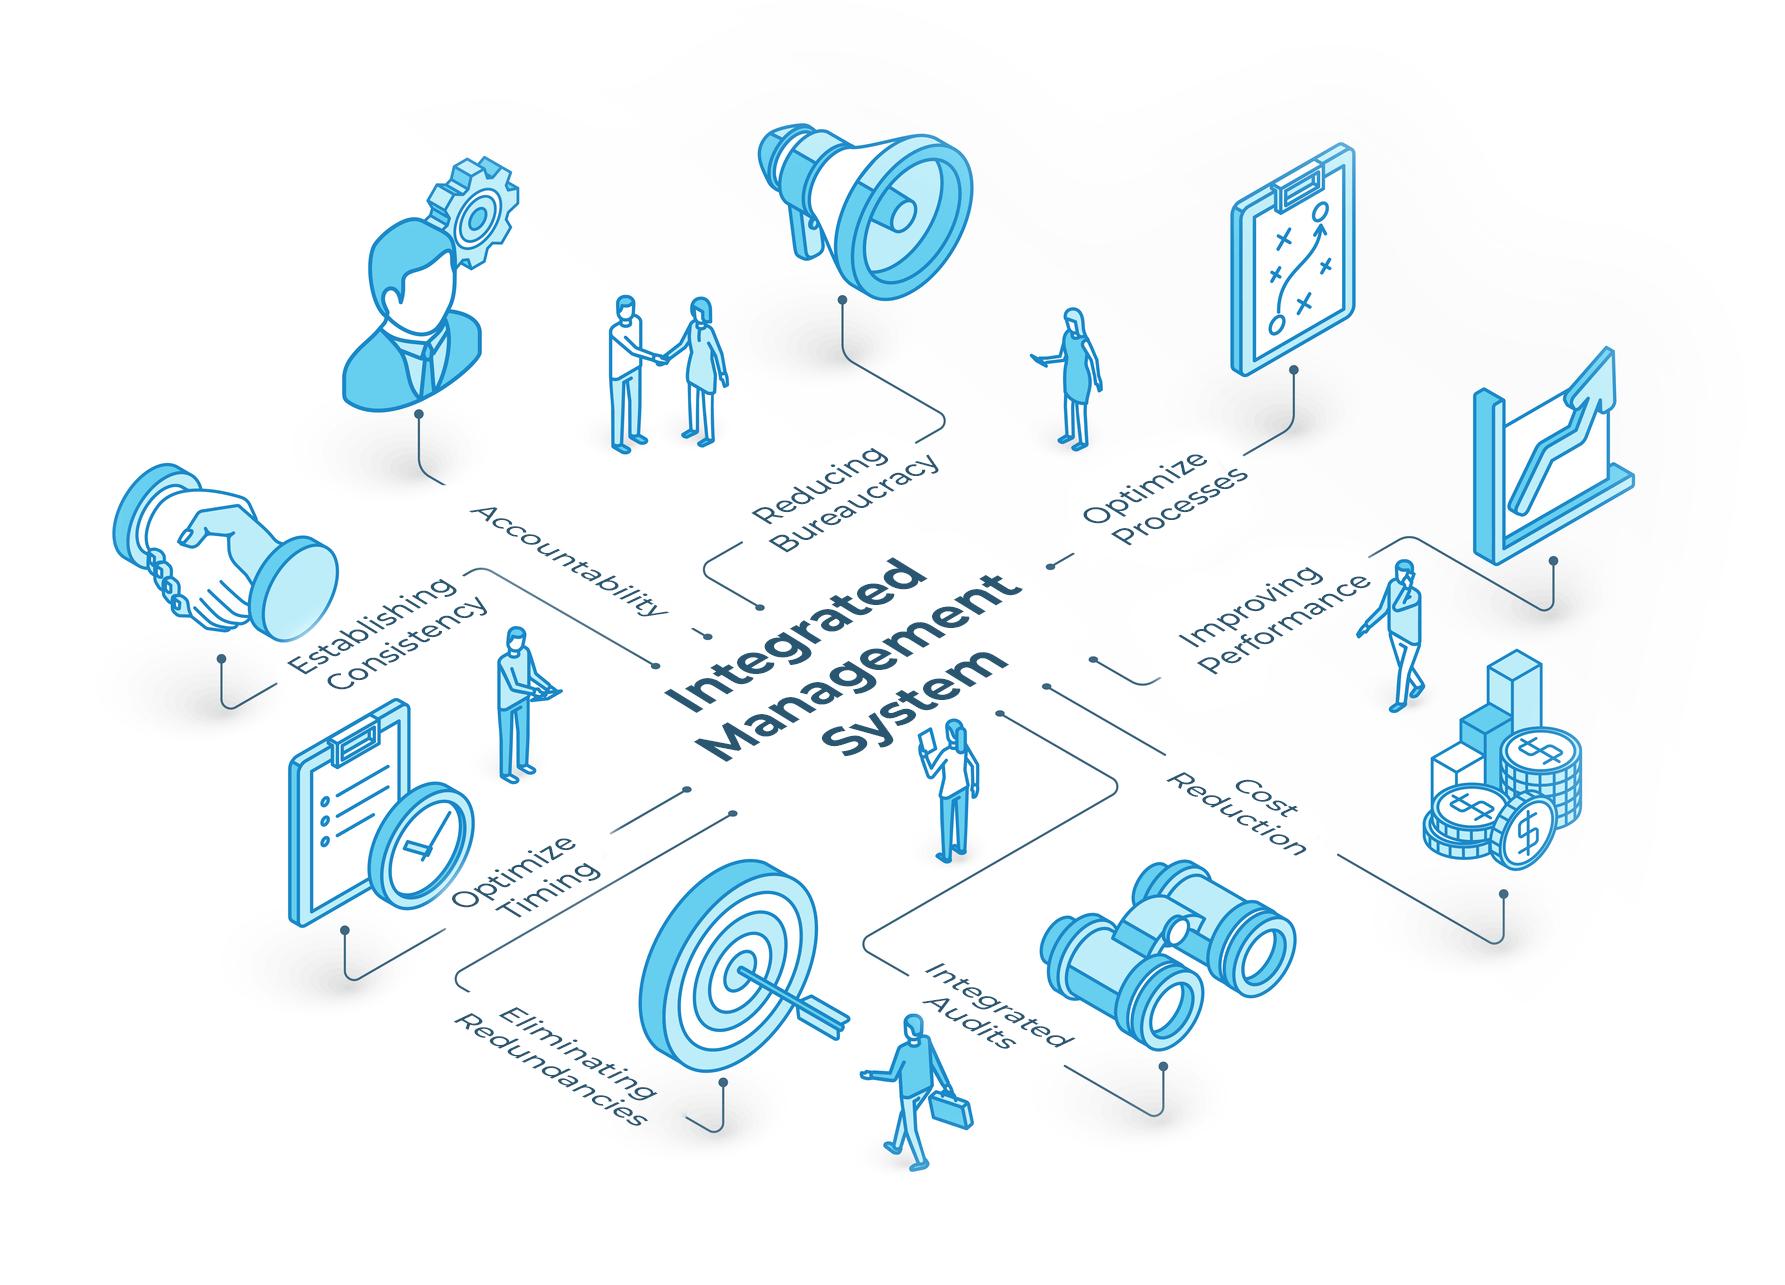 IntegratedManagementSystem